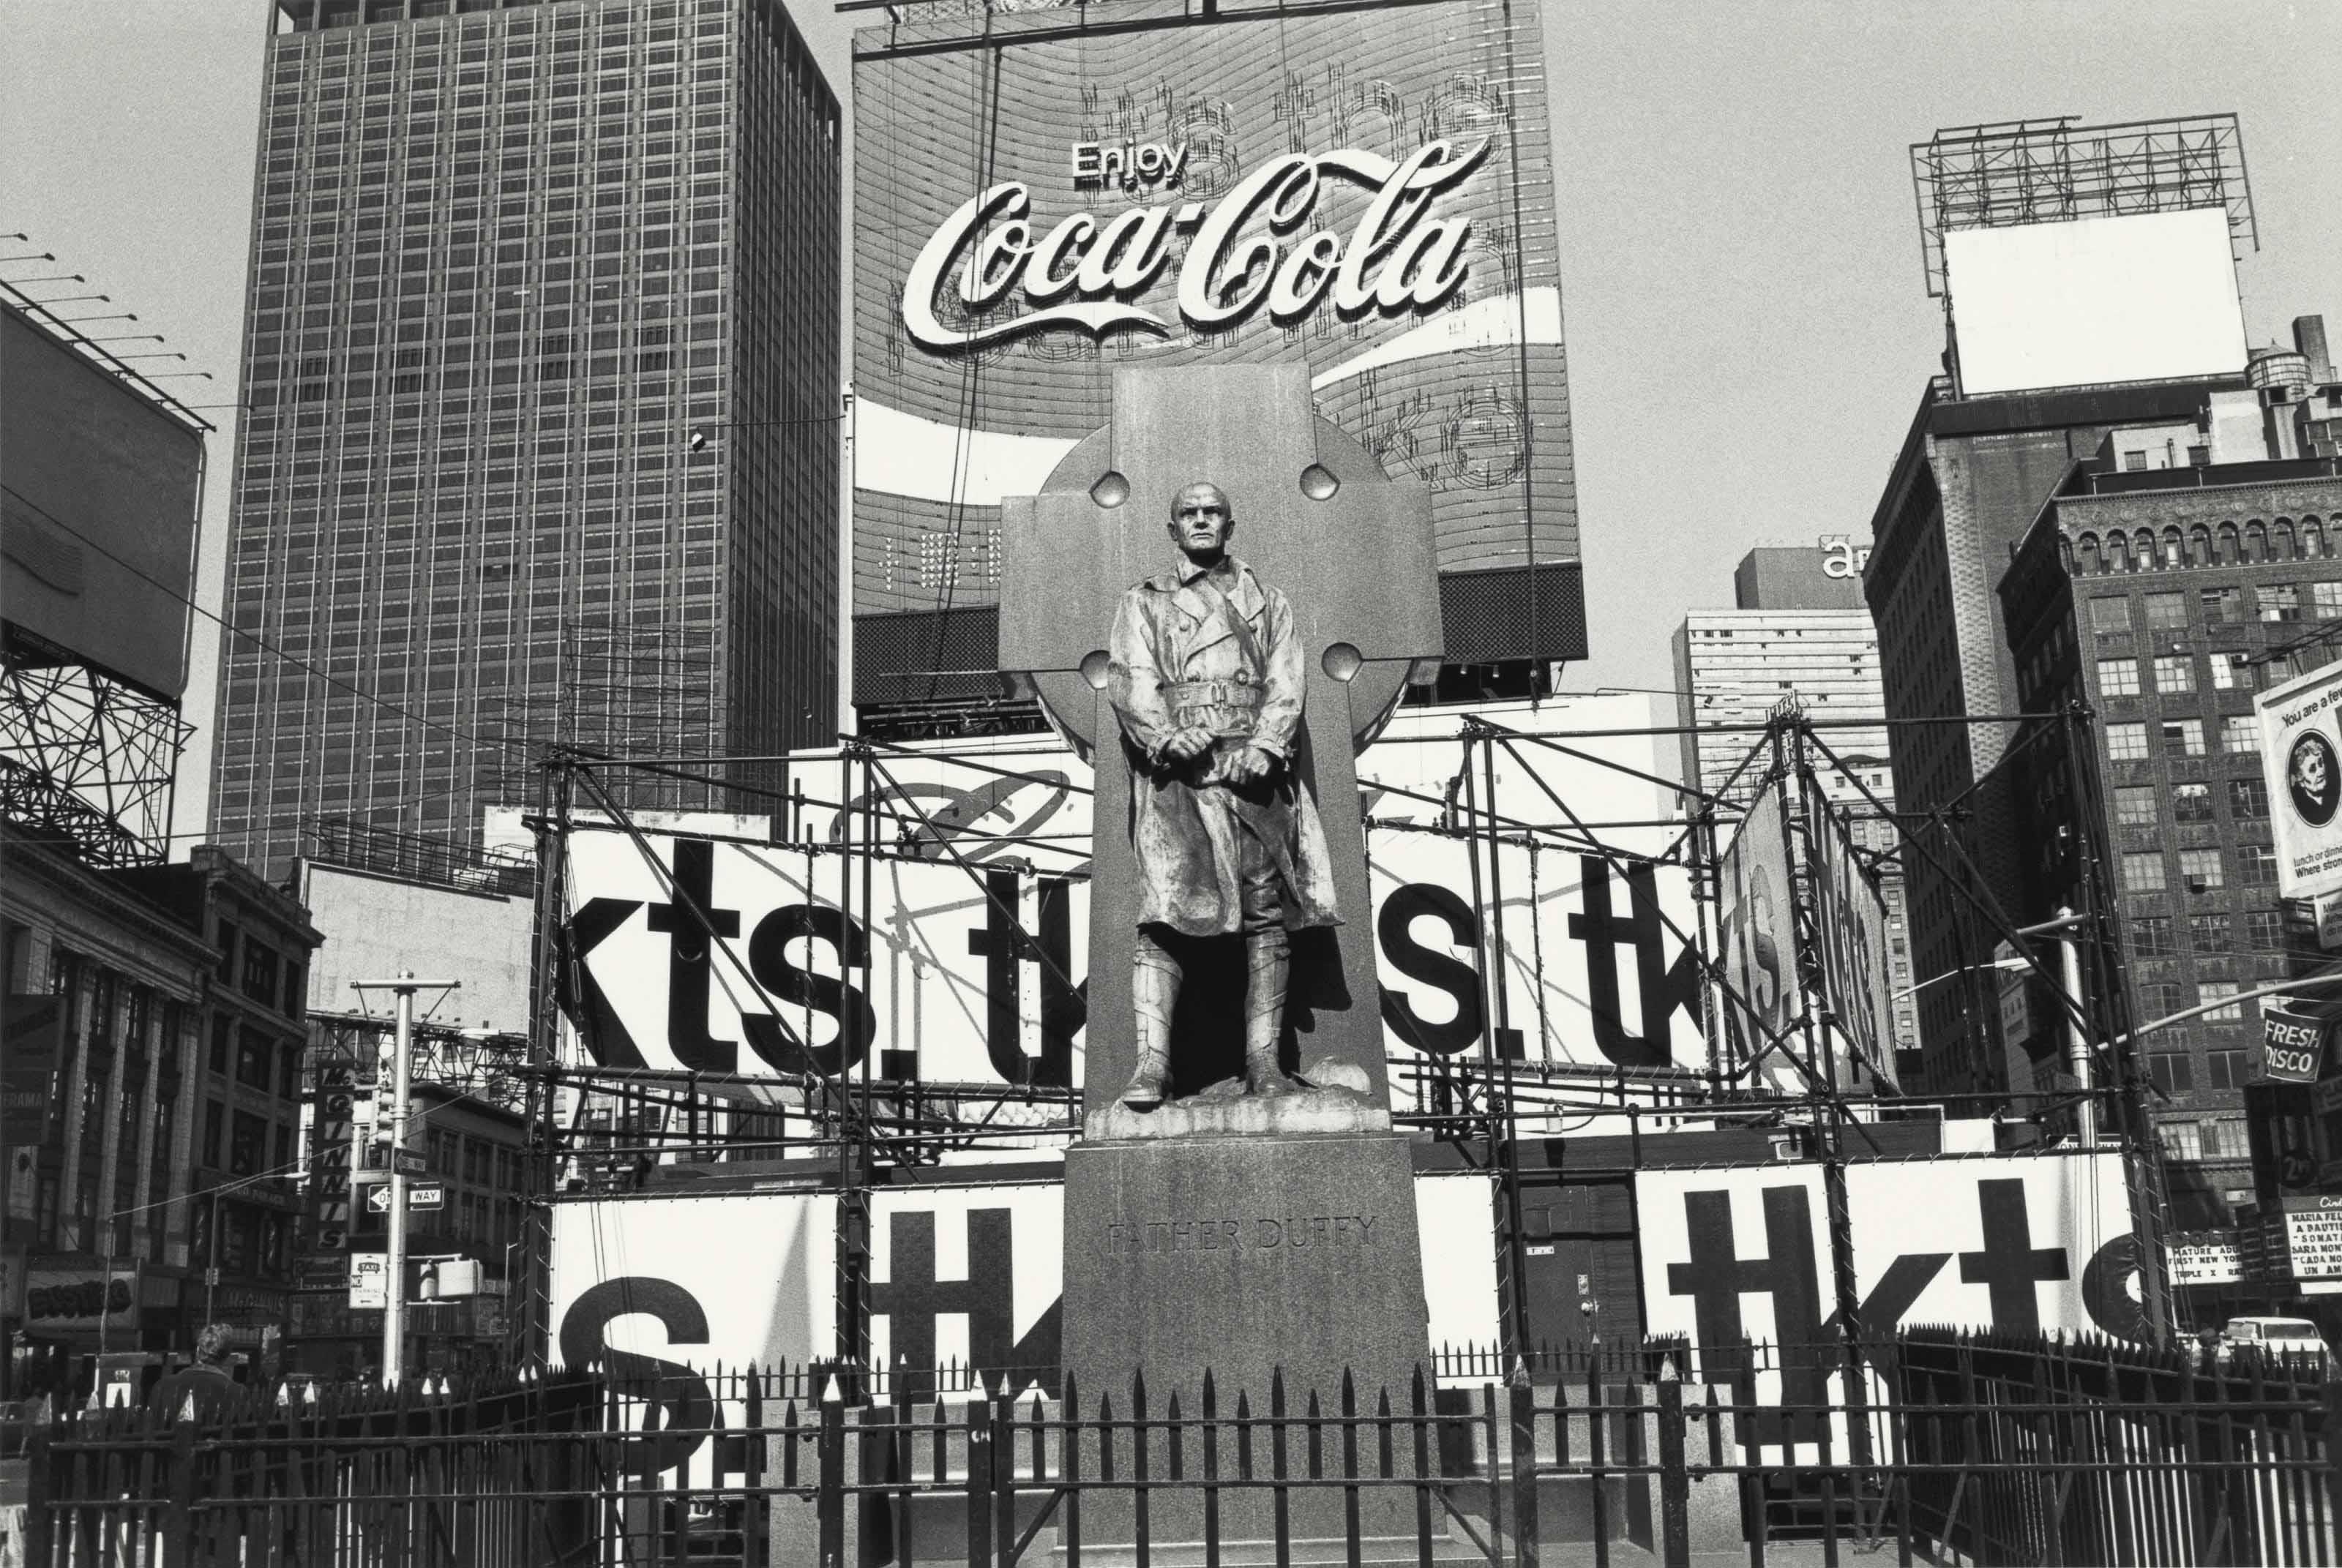 New York City, 1974